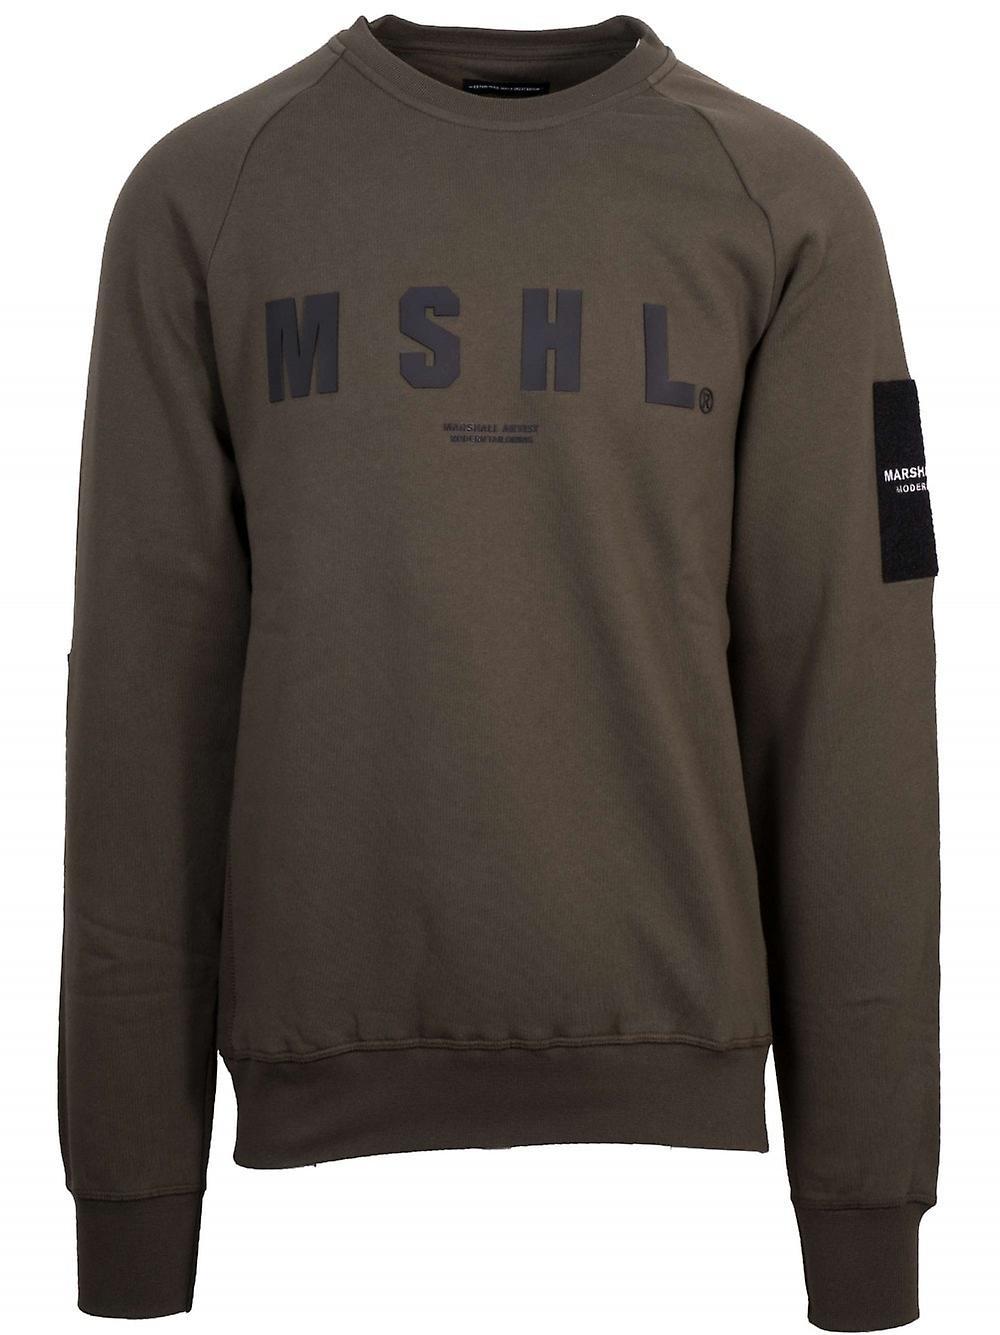 Marshall Artist Marshall Artist Khaki Hybrid Tech Sweatshirt